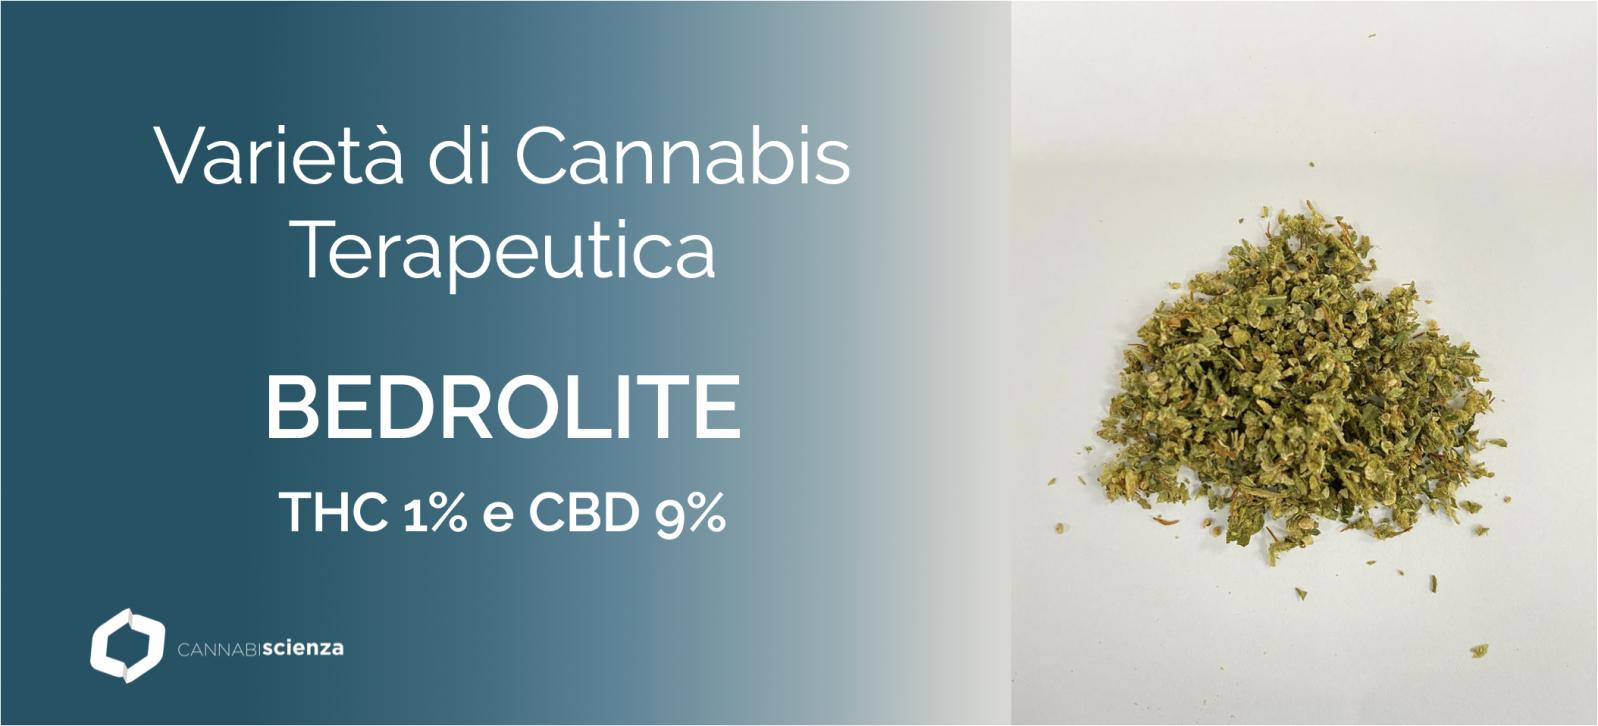 Bedrolite - Cannabis terapeutica - Cannabiscienza